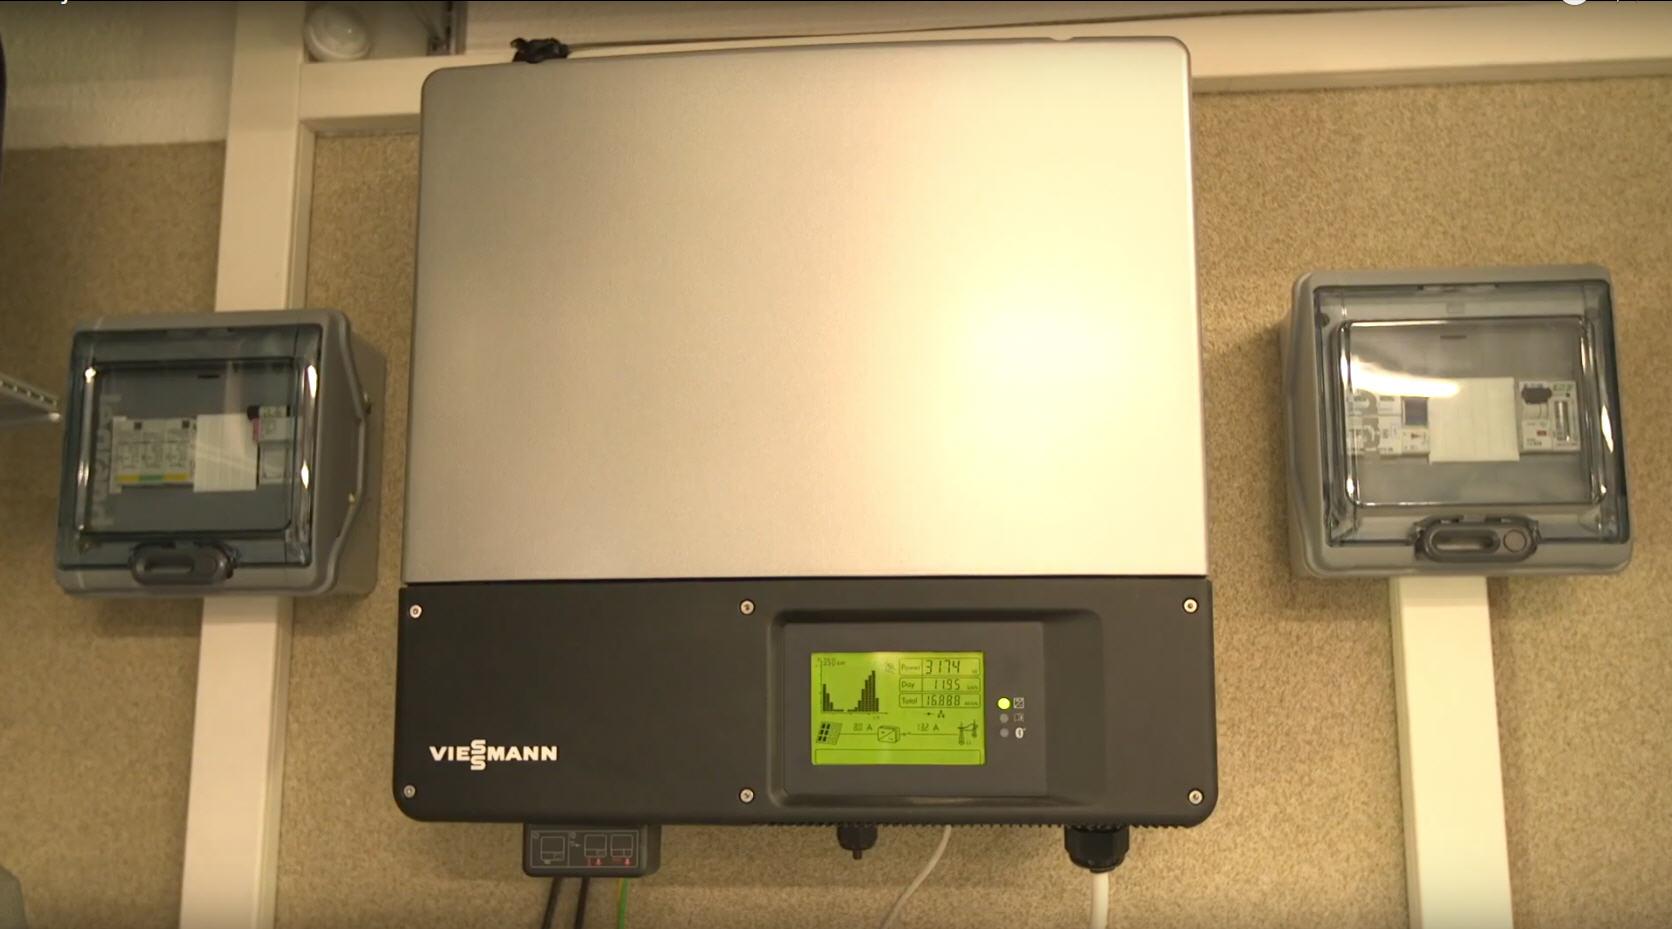 Inwerter instalacji PV